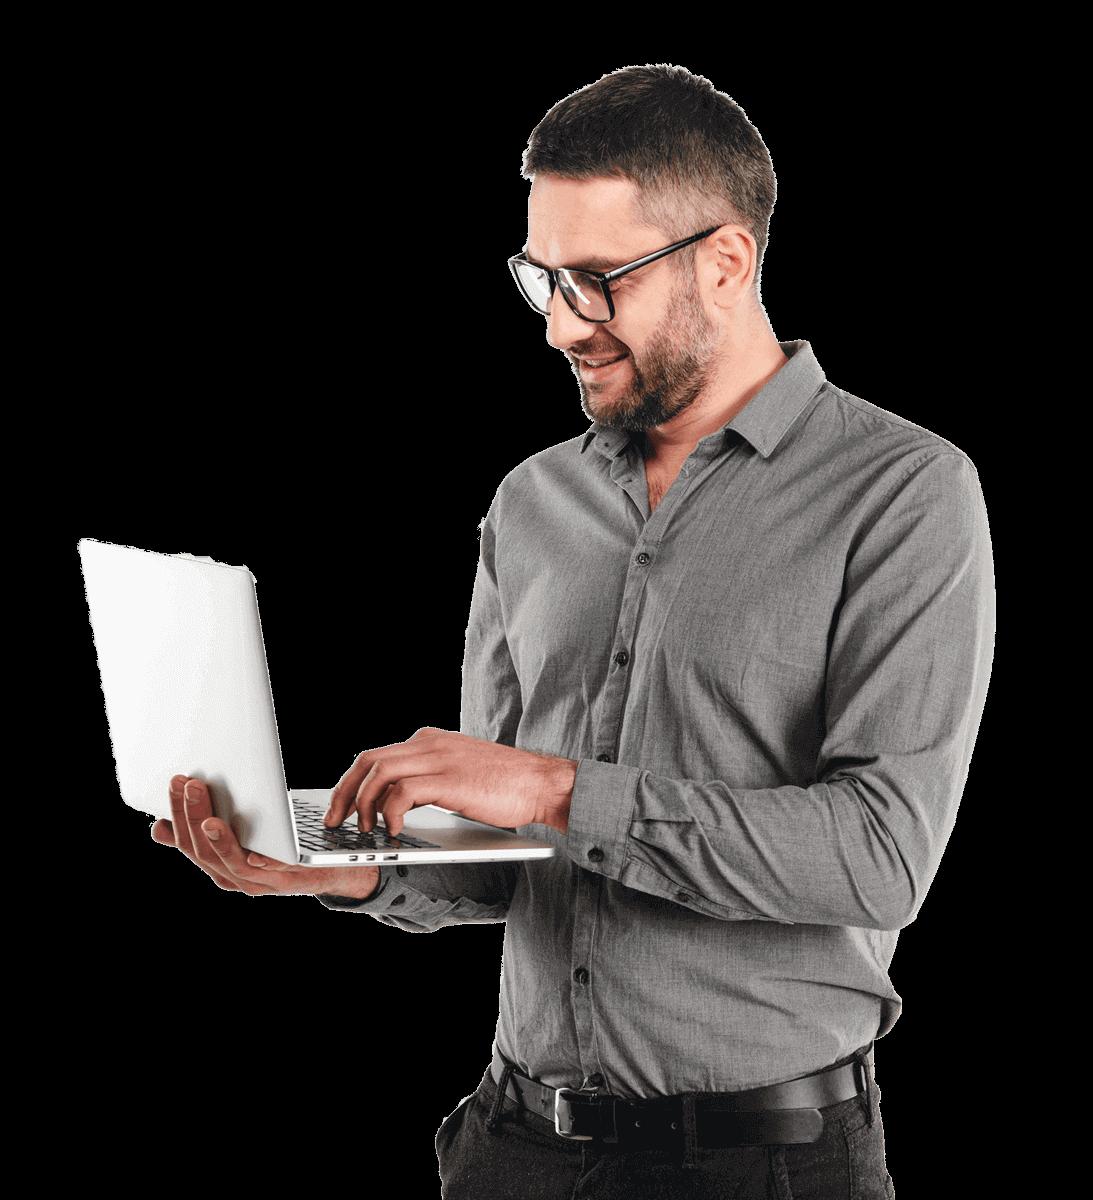 happy man using laptop computer PBY7RDV